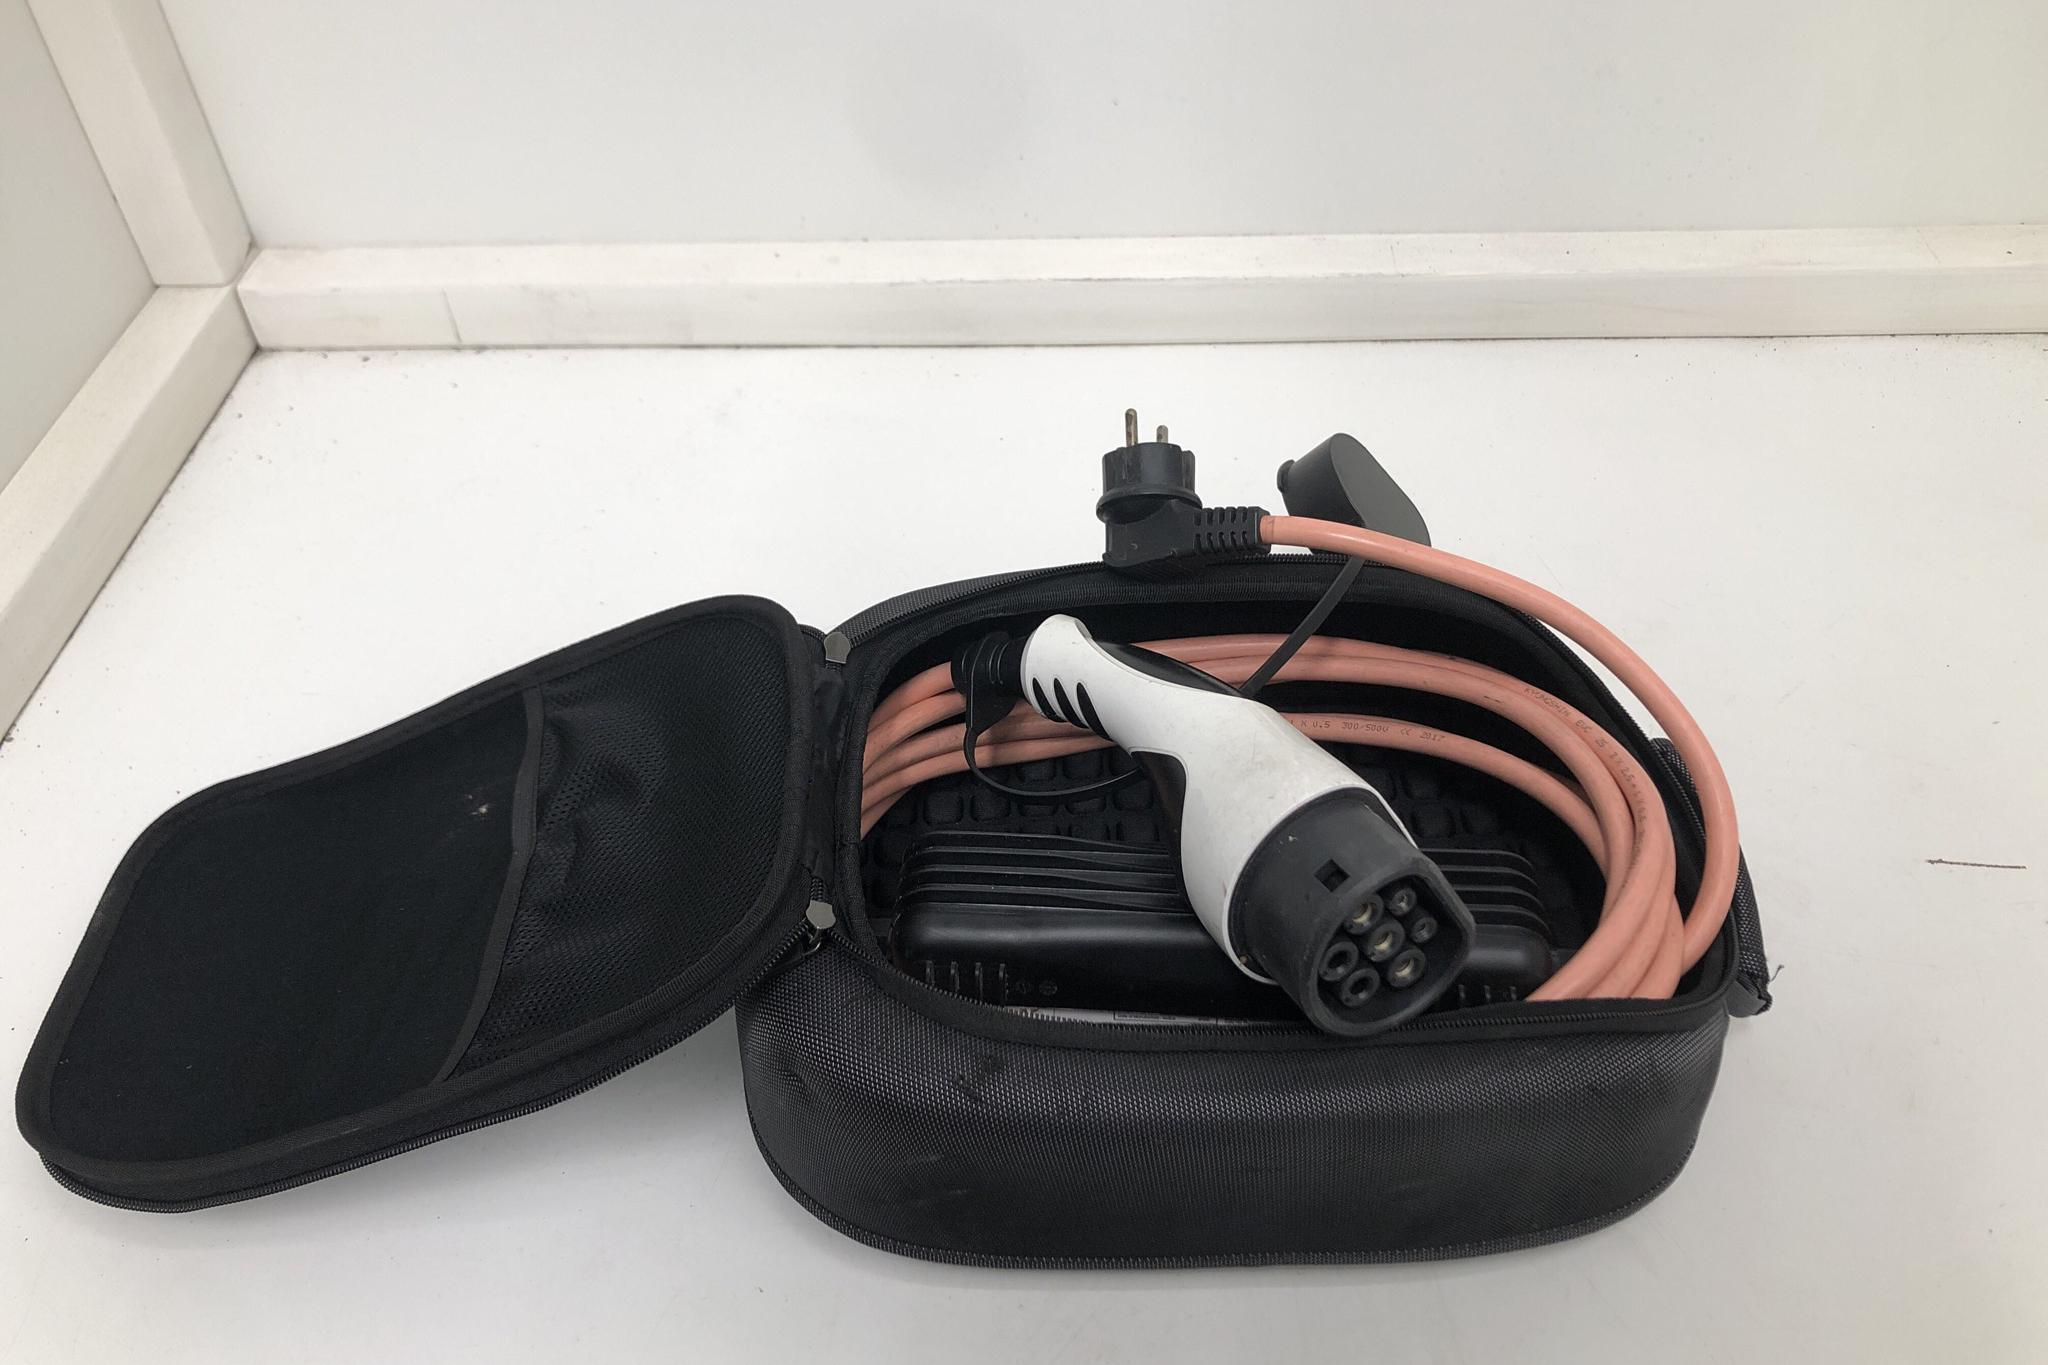 KIA Niro Plug-in Hybrid 1.6 (141hk) - 11 529 mil - Automat - grå - 2018